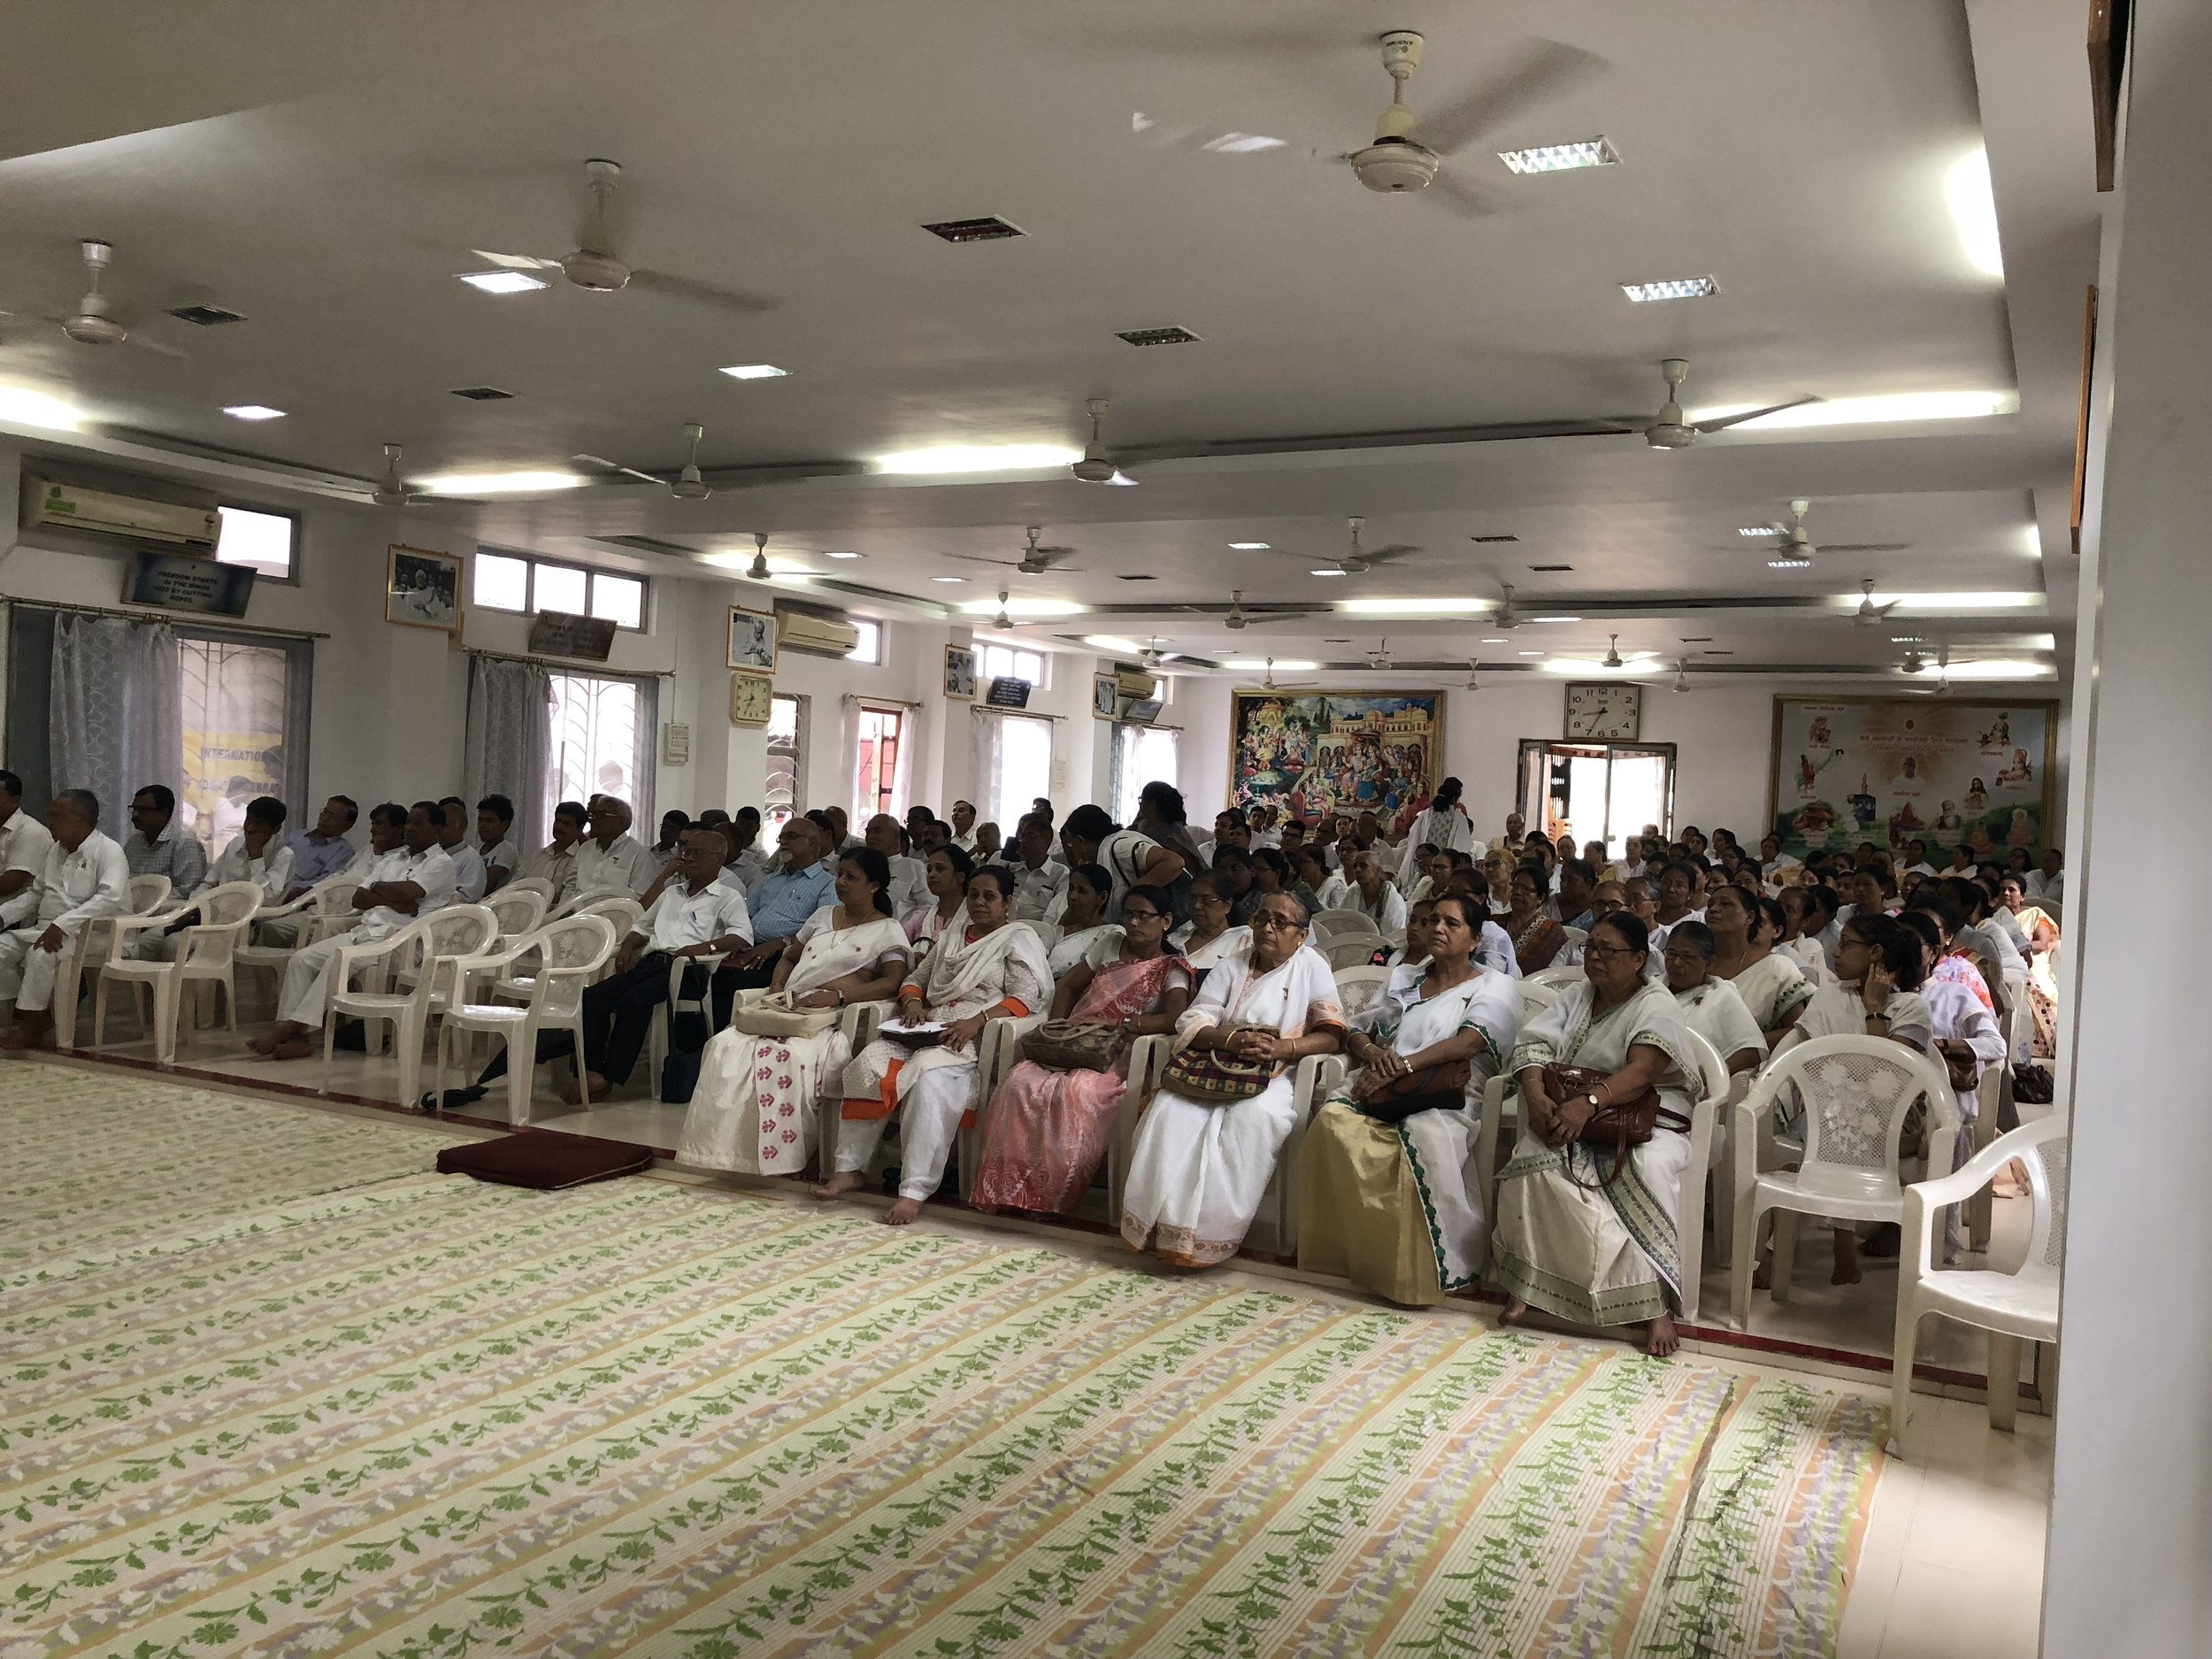 Event: Organized by Bodhana at Prajapati Brahma Kumaris, Guwahati